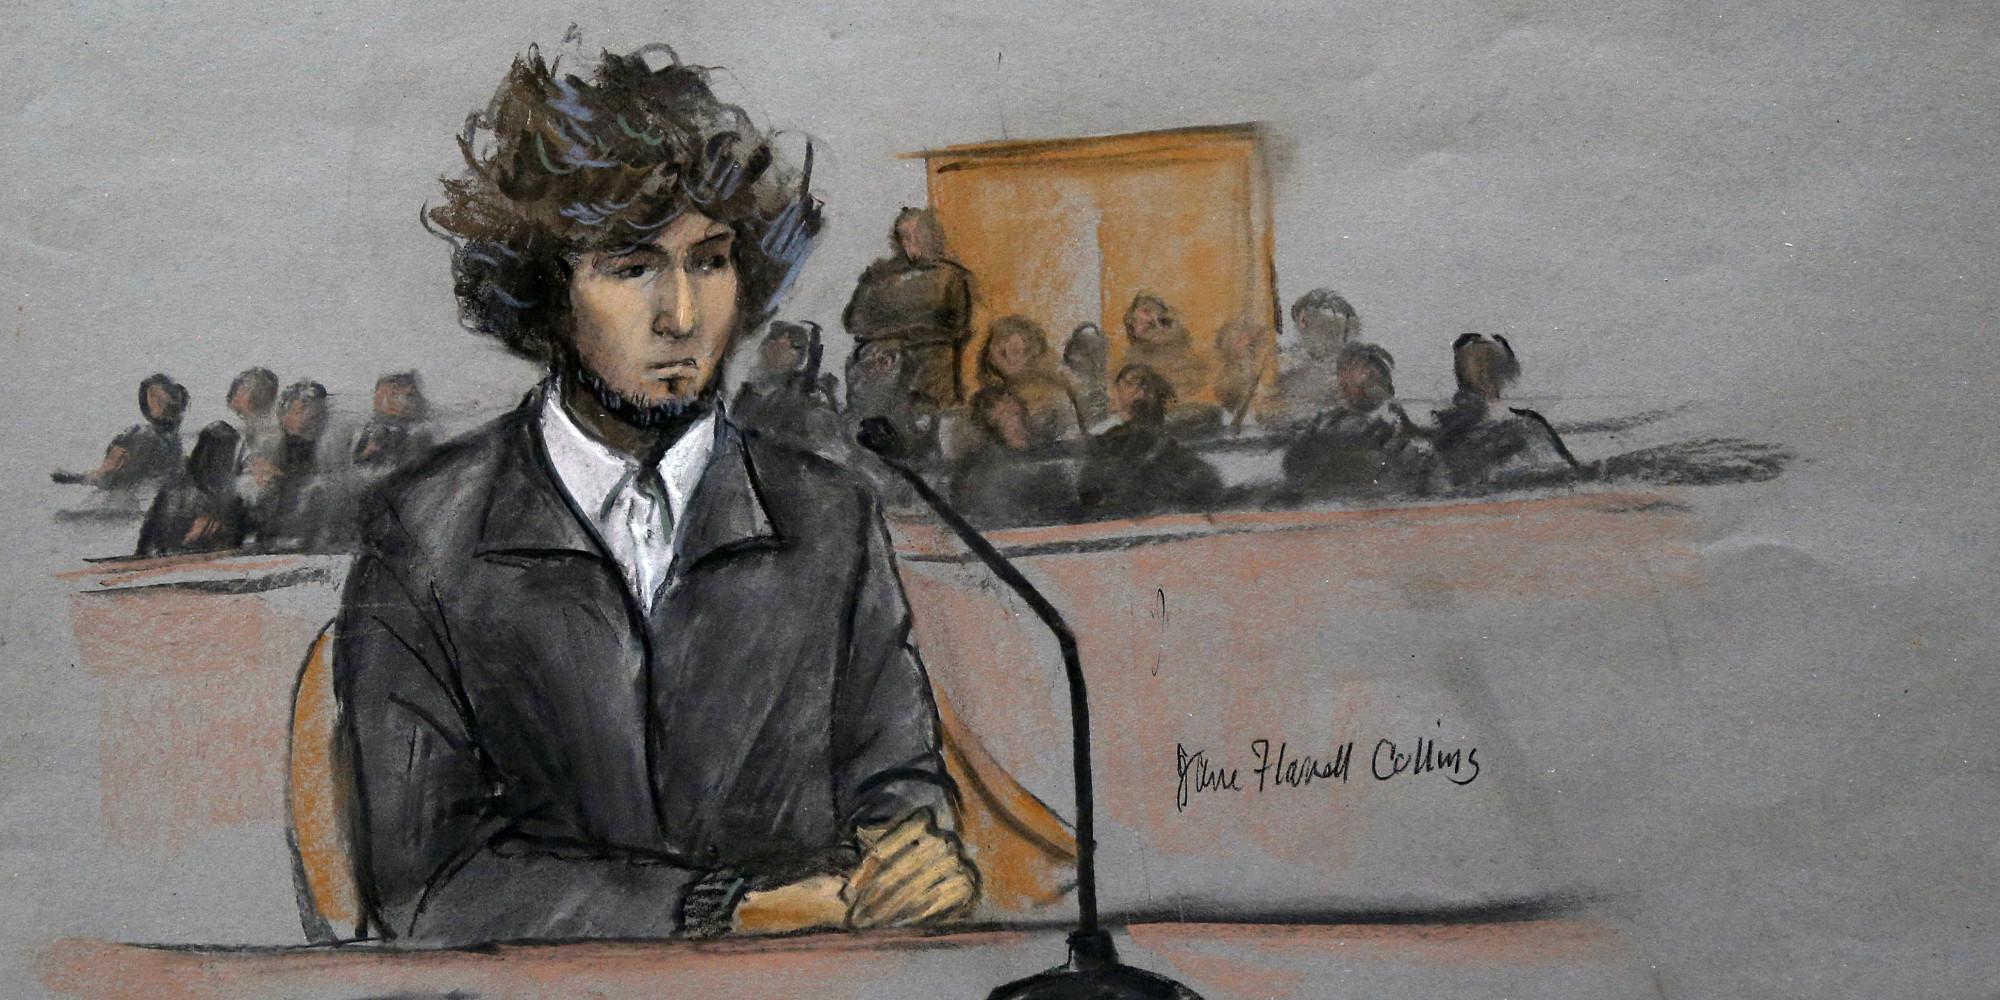 Dzhokhar Tsarnaev sentenced to death 3 years ago, where is ...